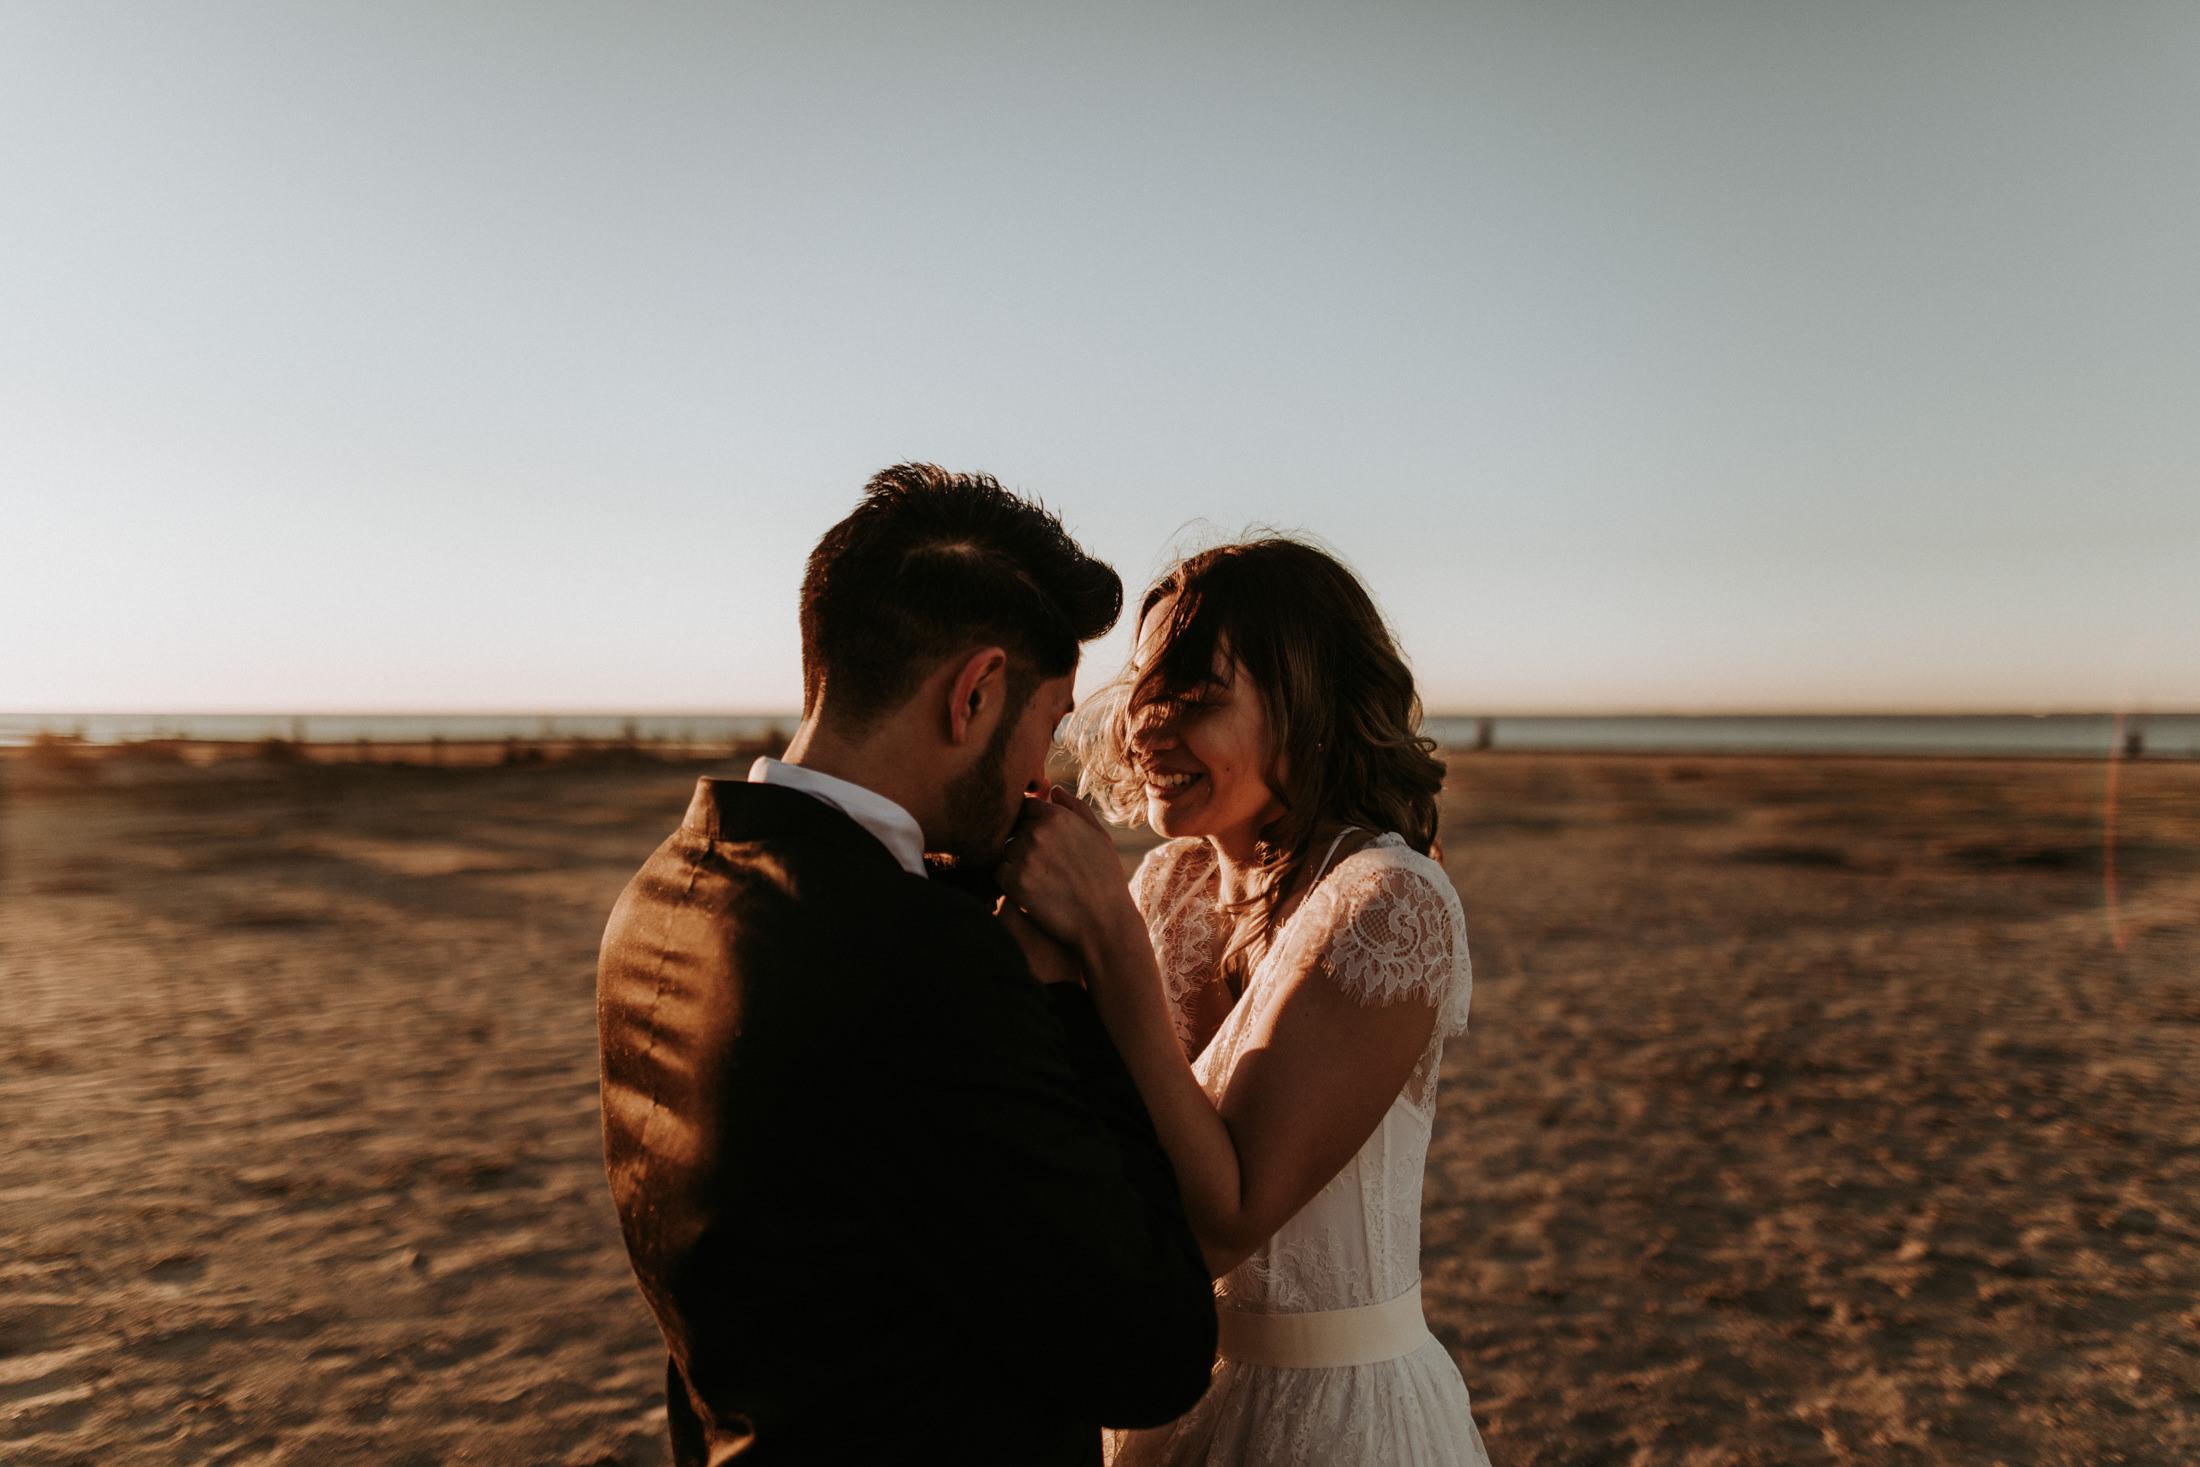 Wedding_Photographer_Mallorca_Daniela-Marquardt_Photography_CanaryIslands_Lanzarote_Iceland_Tuskany_Santorini_Portugal_Schweiz_Austria_Bayern_Elopement_Hochzeitsfotograf_Norddeichich_66